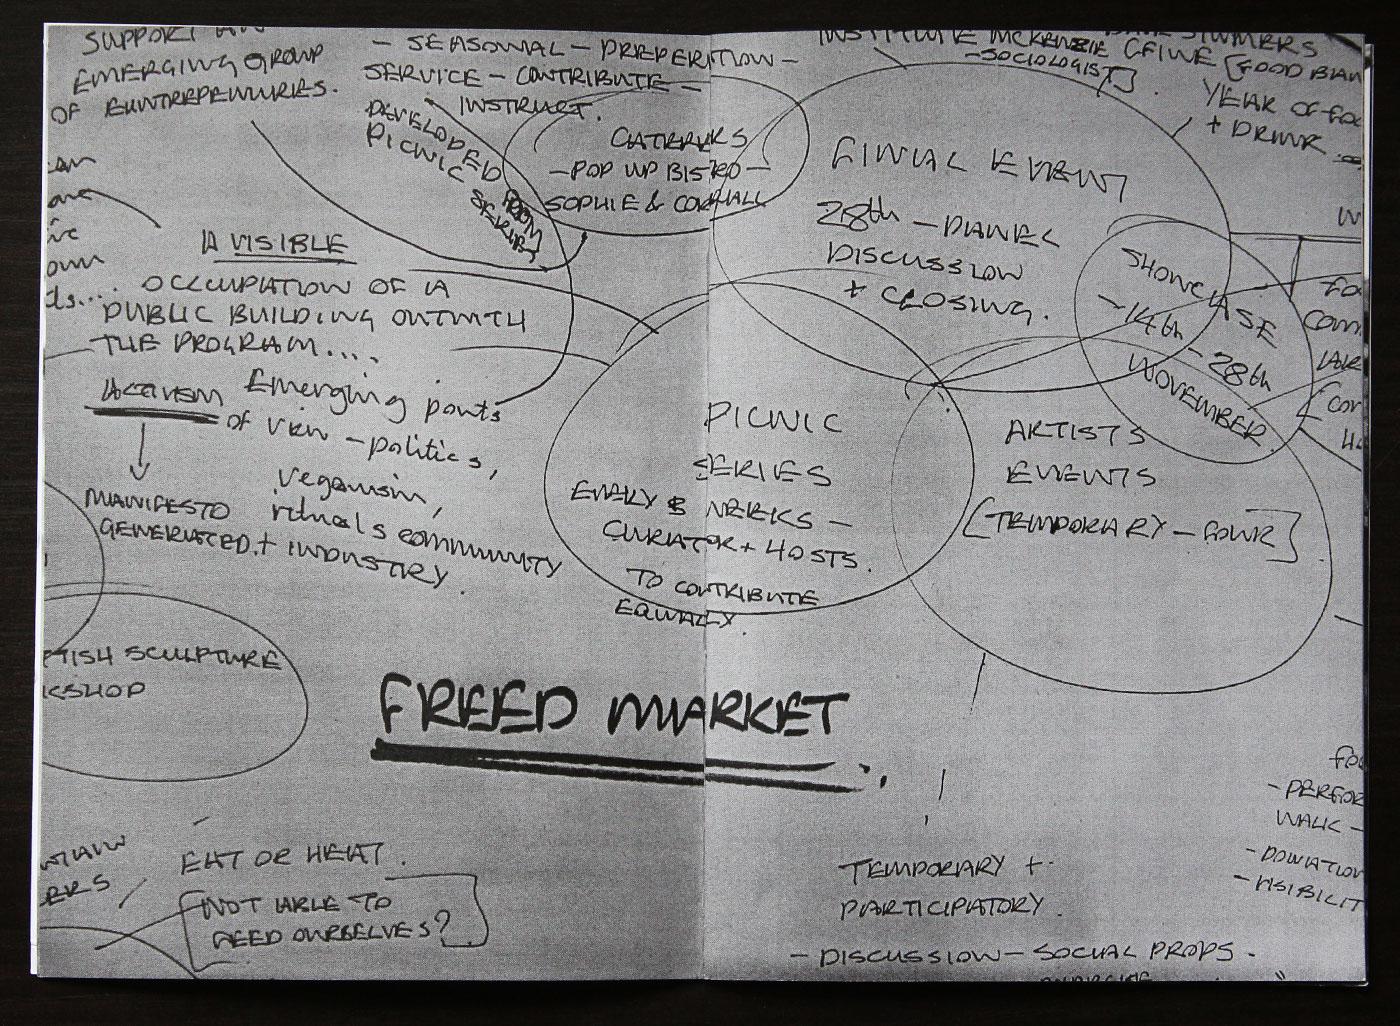 arts scotland Freed MArket rachel grant Aberdeen